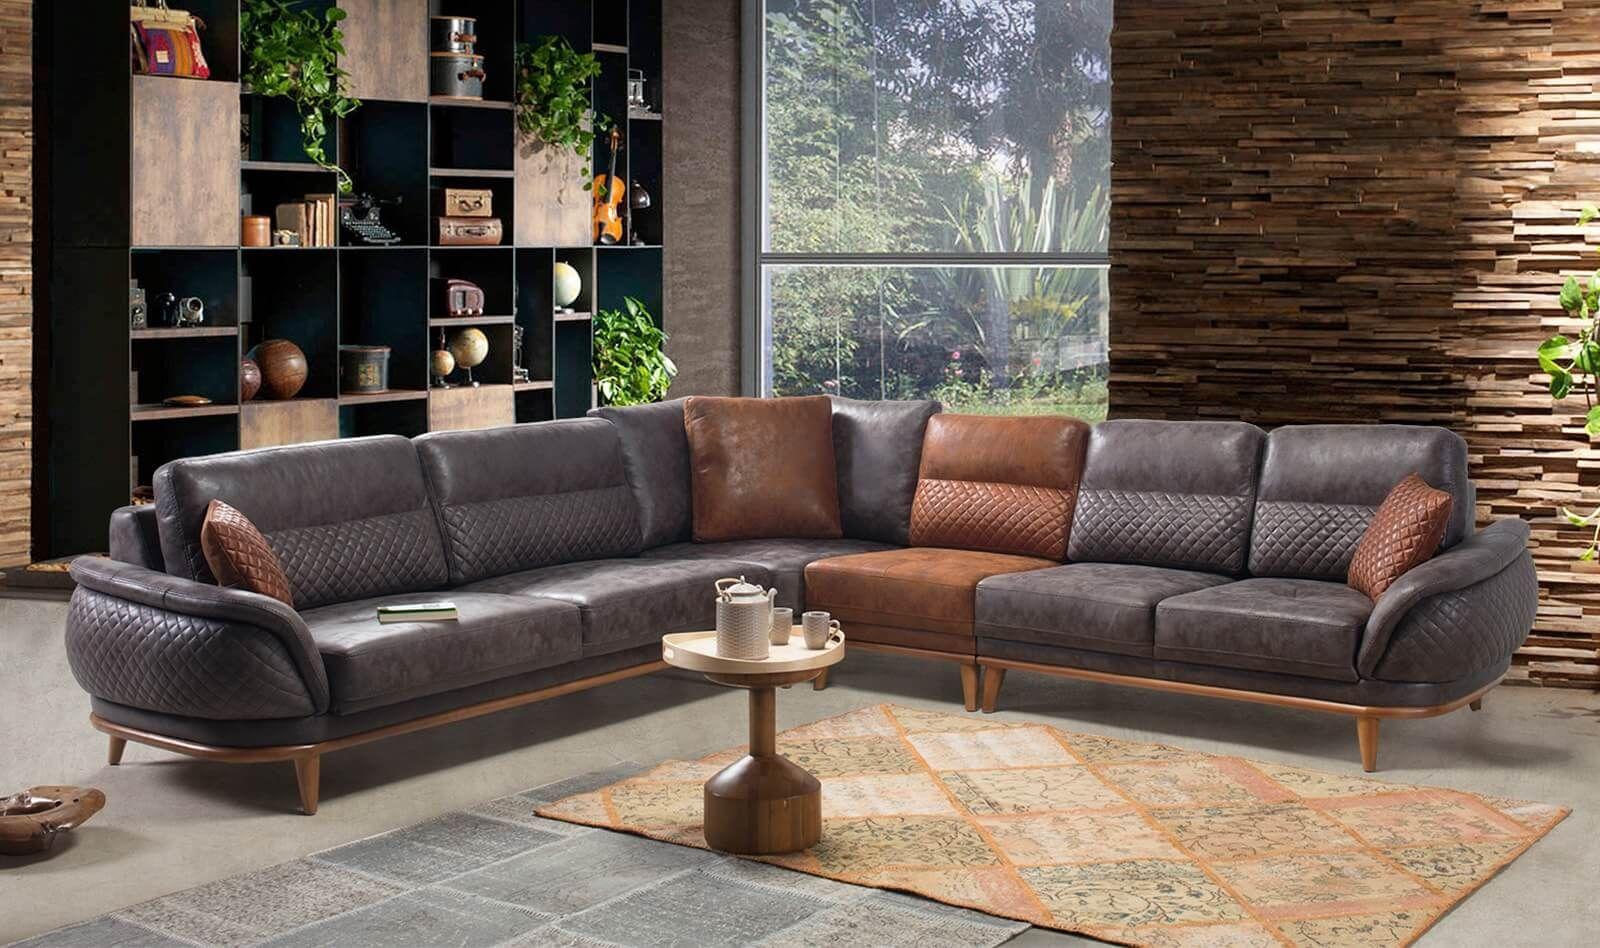 Class Kose Takimi Kose Takimlari Mobilya Furniture Ev Dekorasyonu